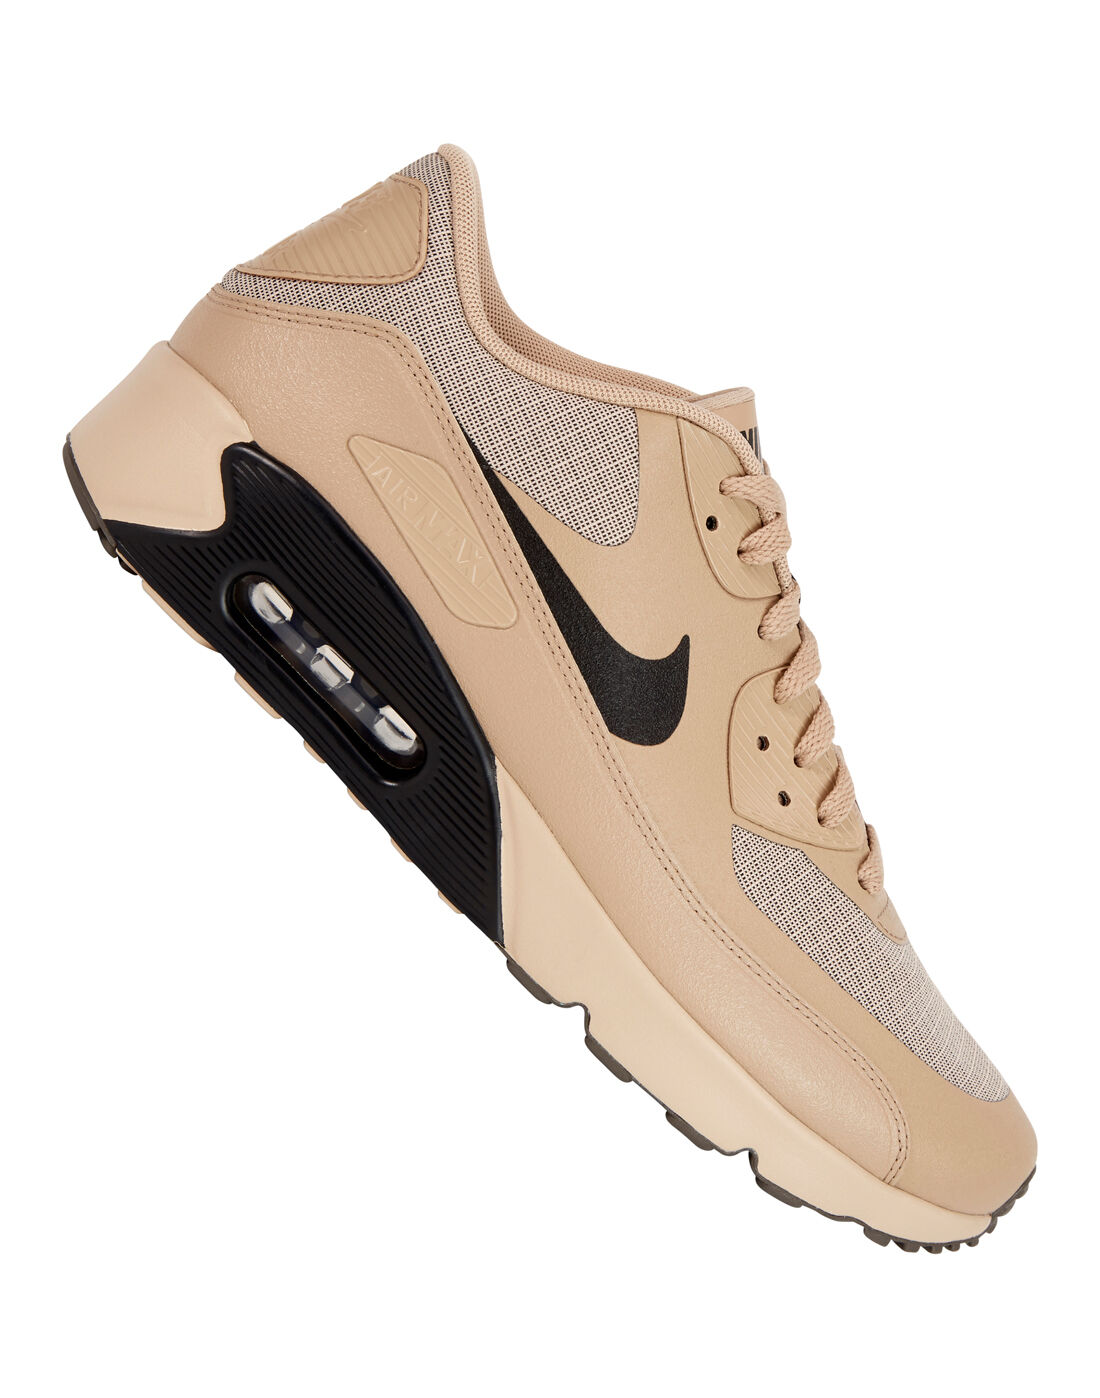 Nike Mens Air Max 90 Ultra 2.0   Cream   Life Style Sports